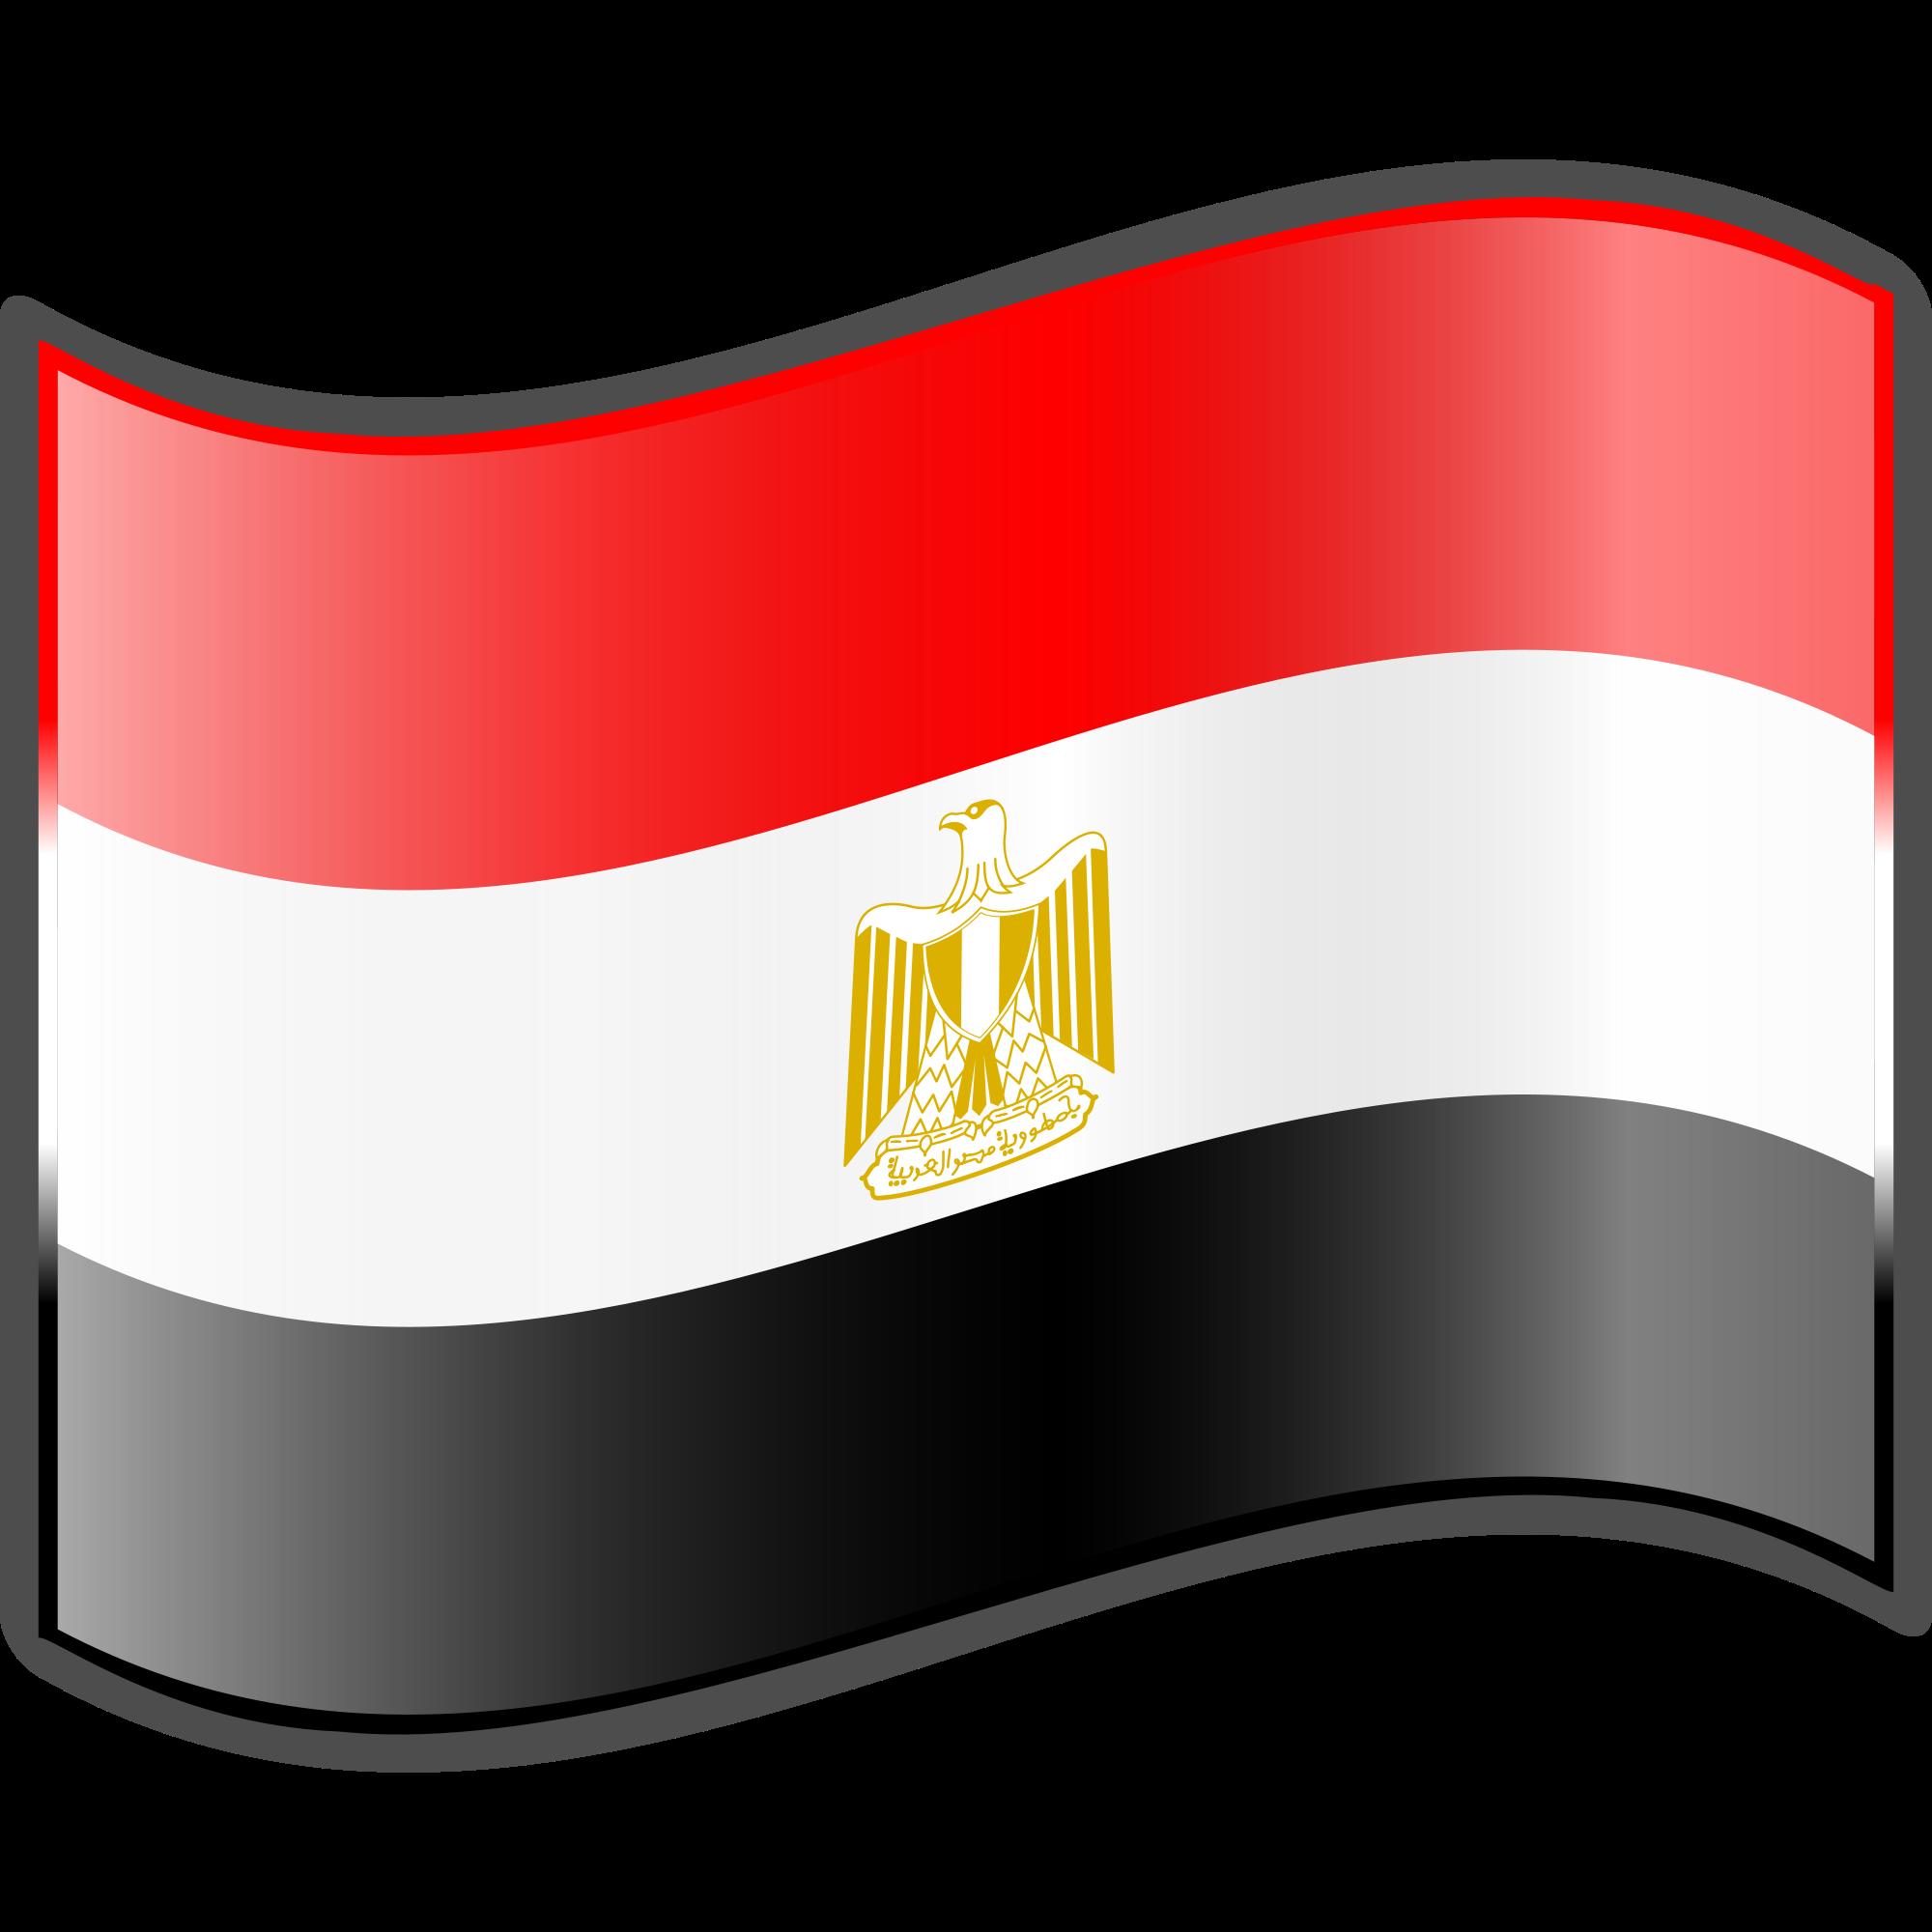 Egypt clipart eygpt. File nuvola egyptian flag